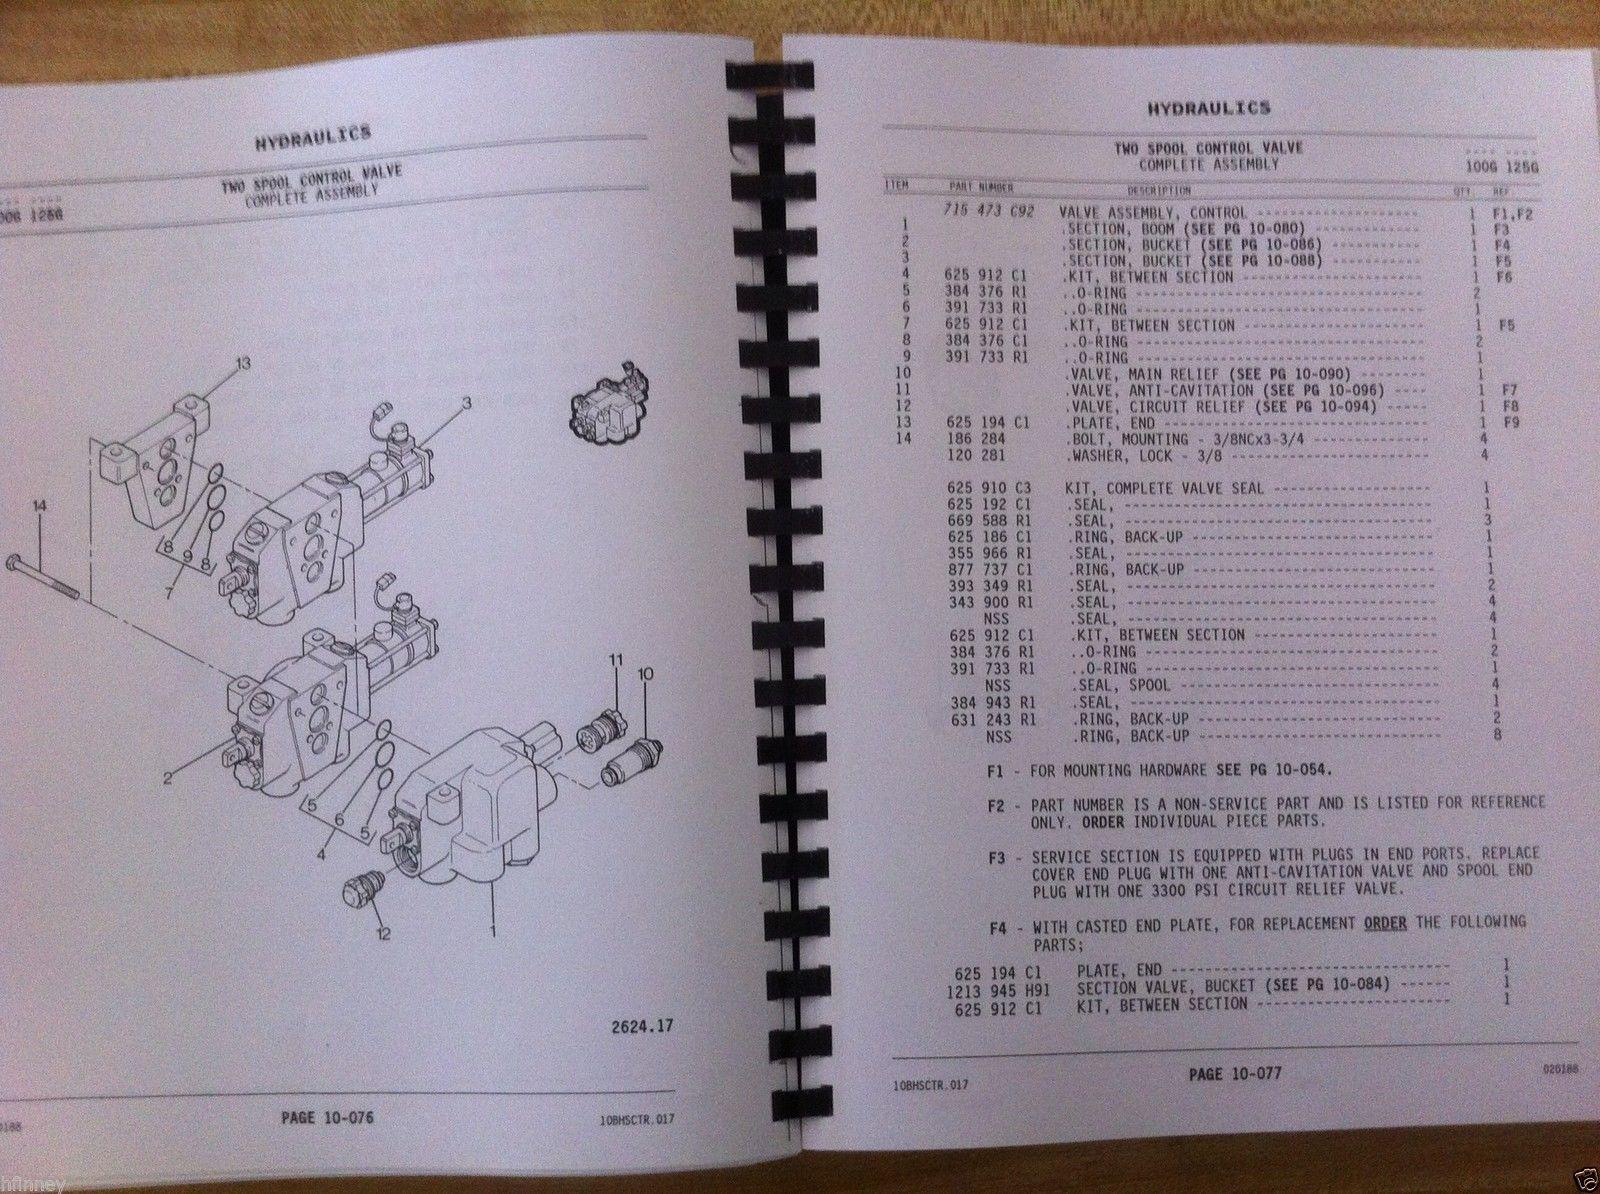 Bulldozer Dresser td7g service Manual